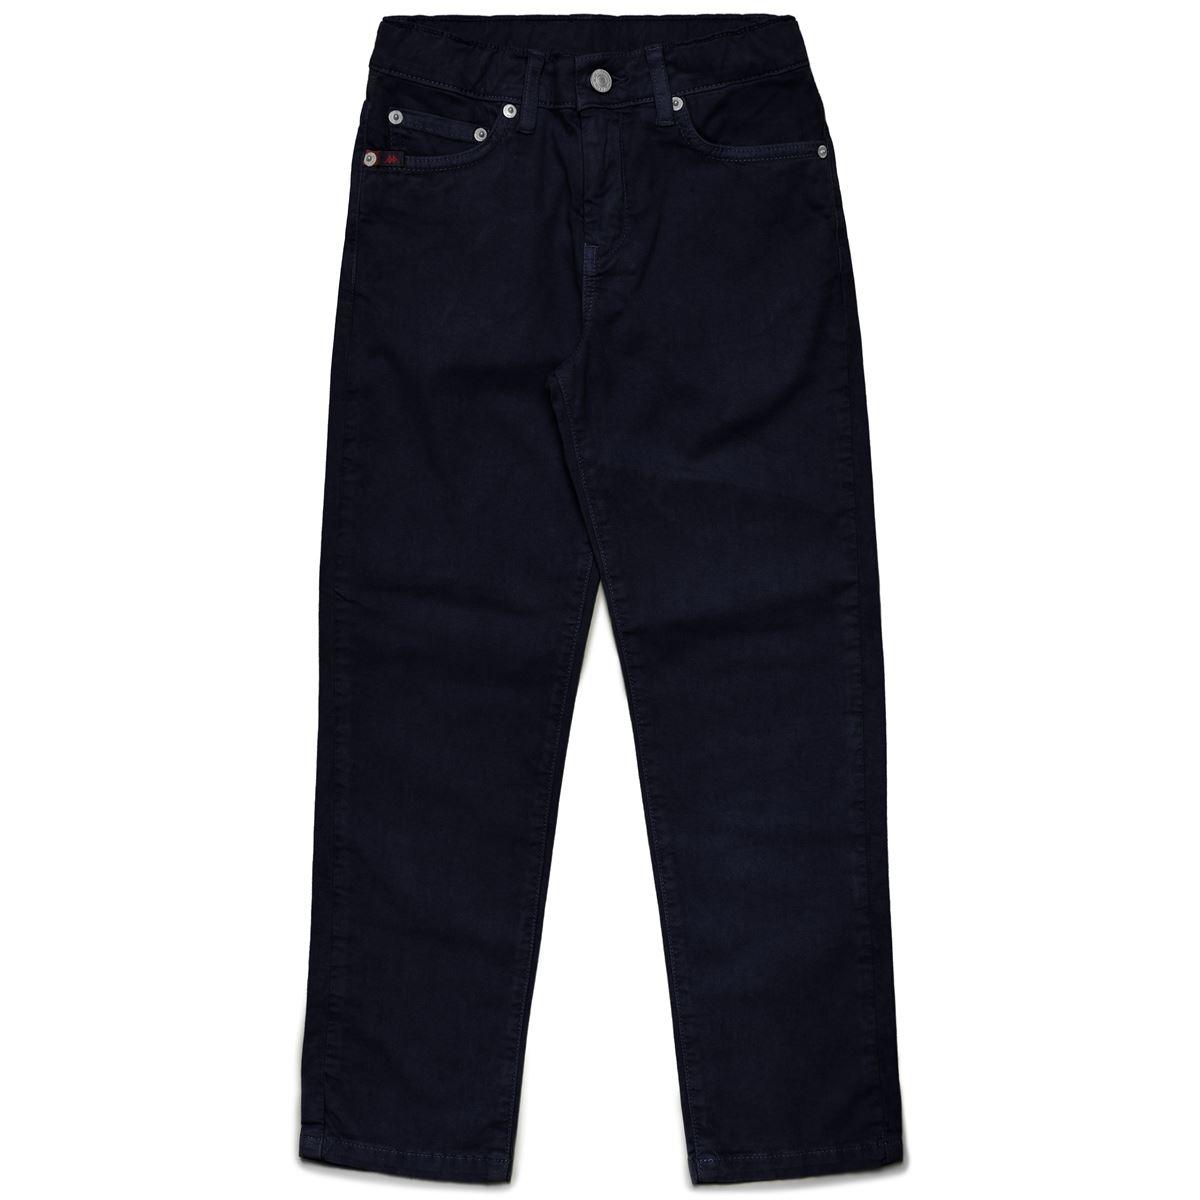 Robe di Kappa Pantaloni donna-601L270